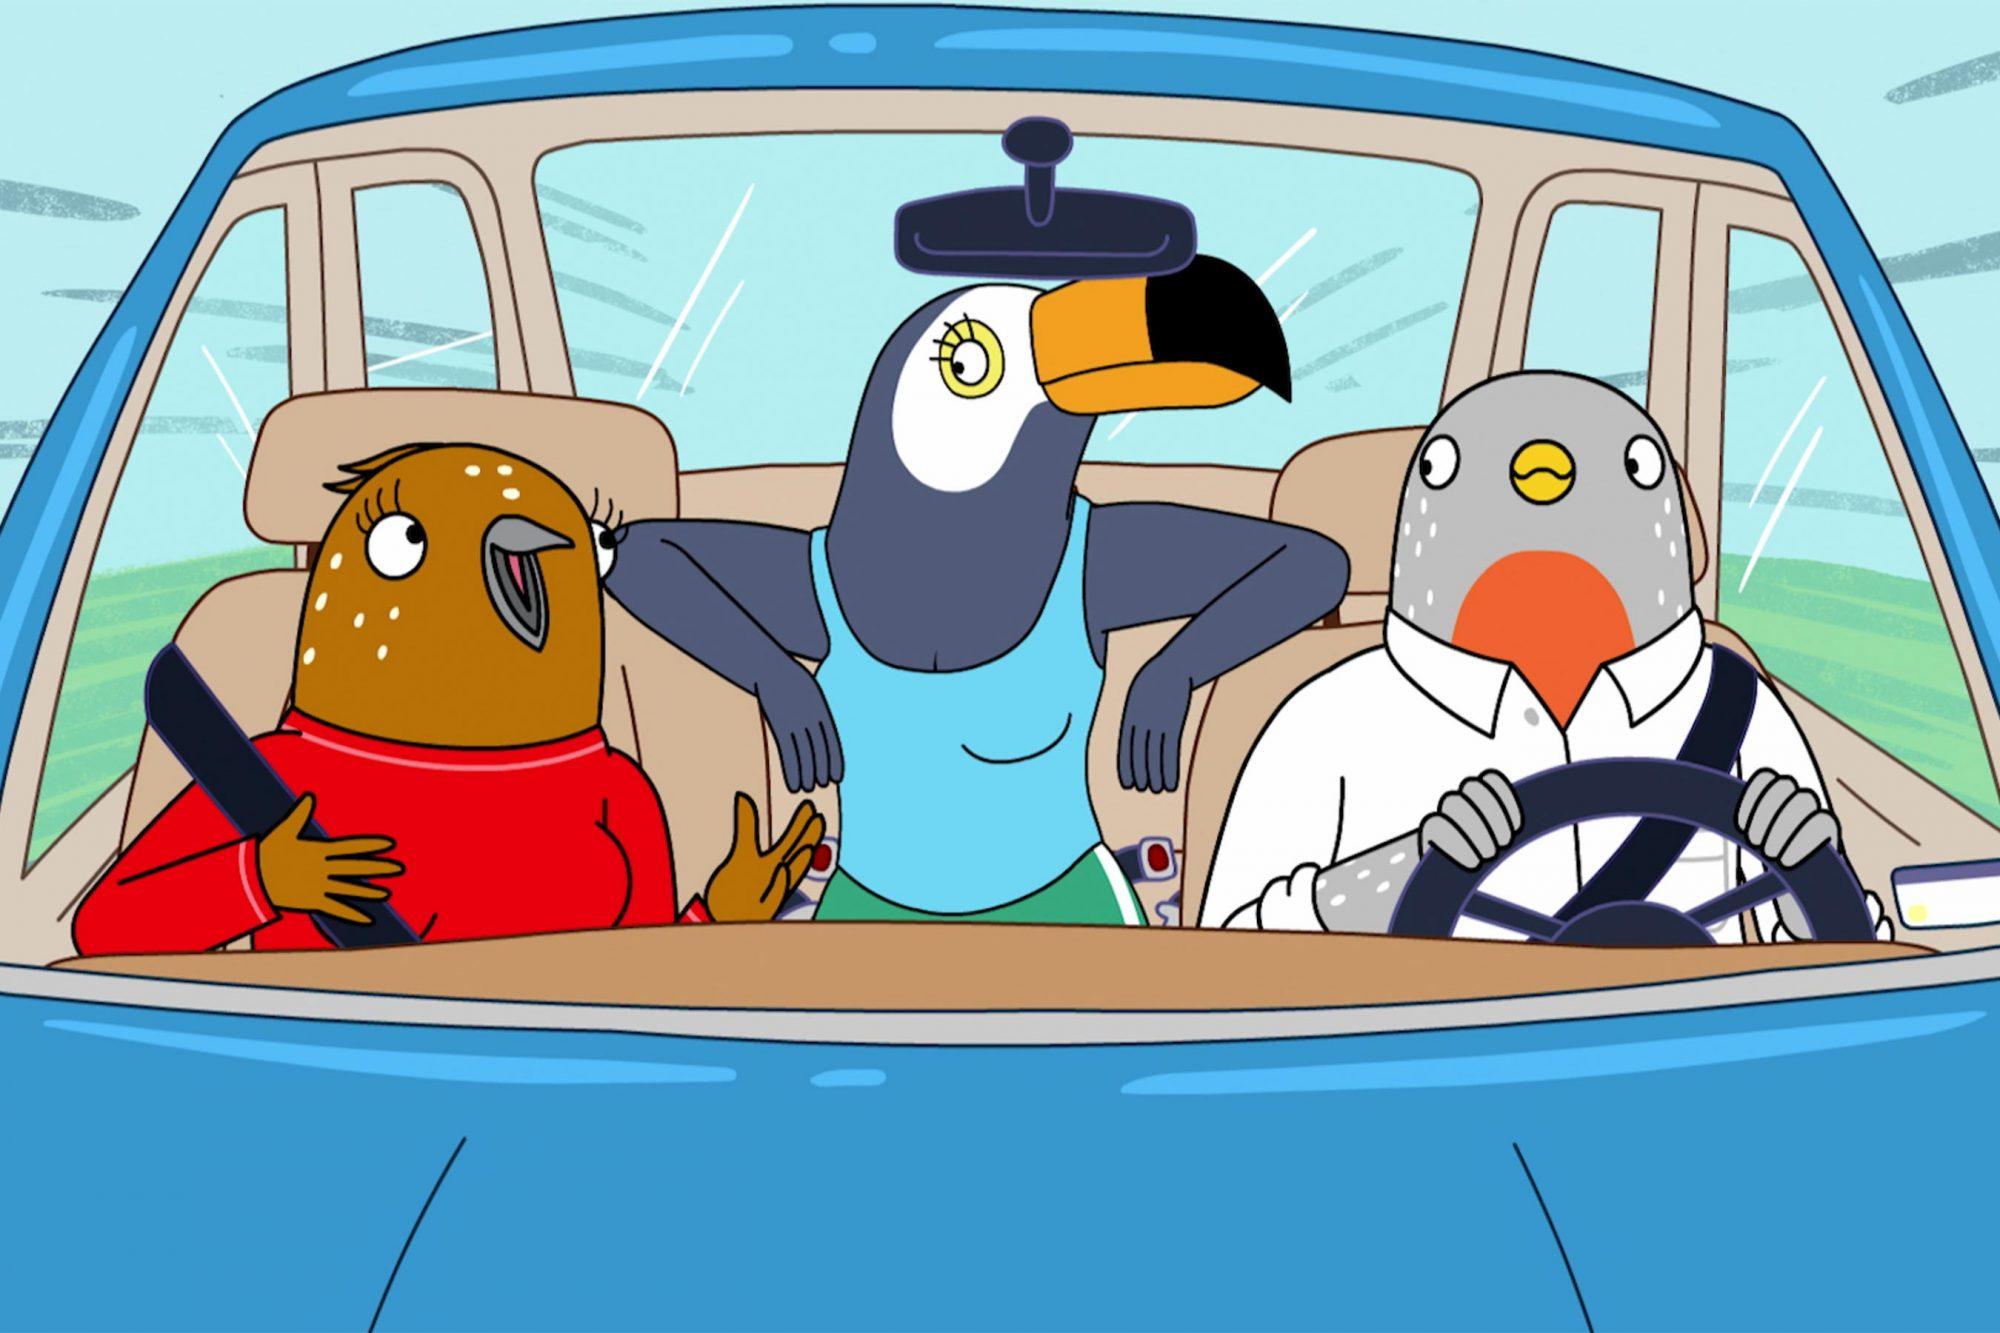 Tuca & Bertie Season 1, Episode 6